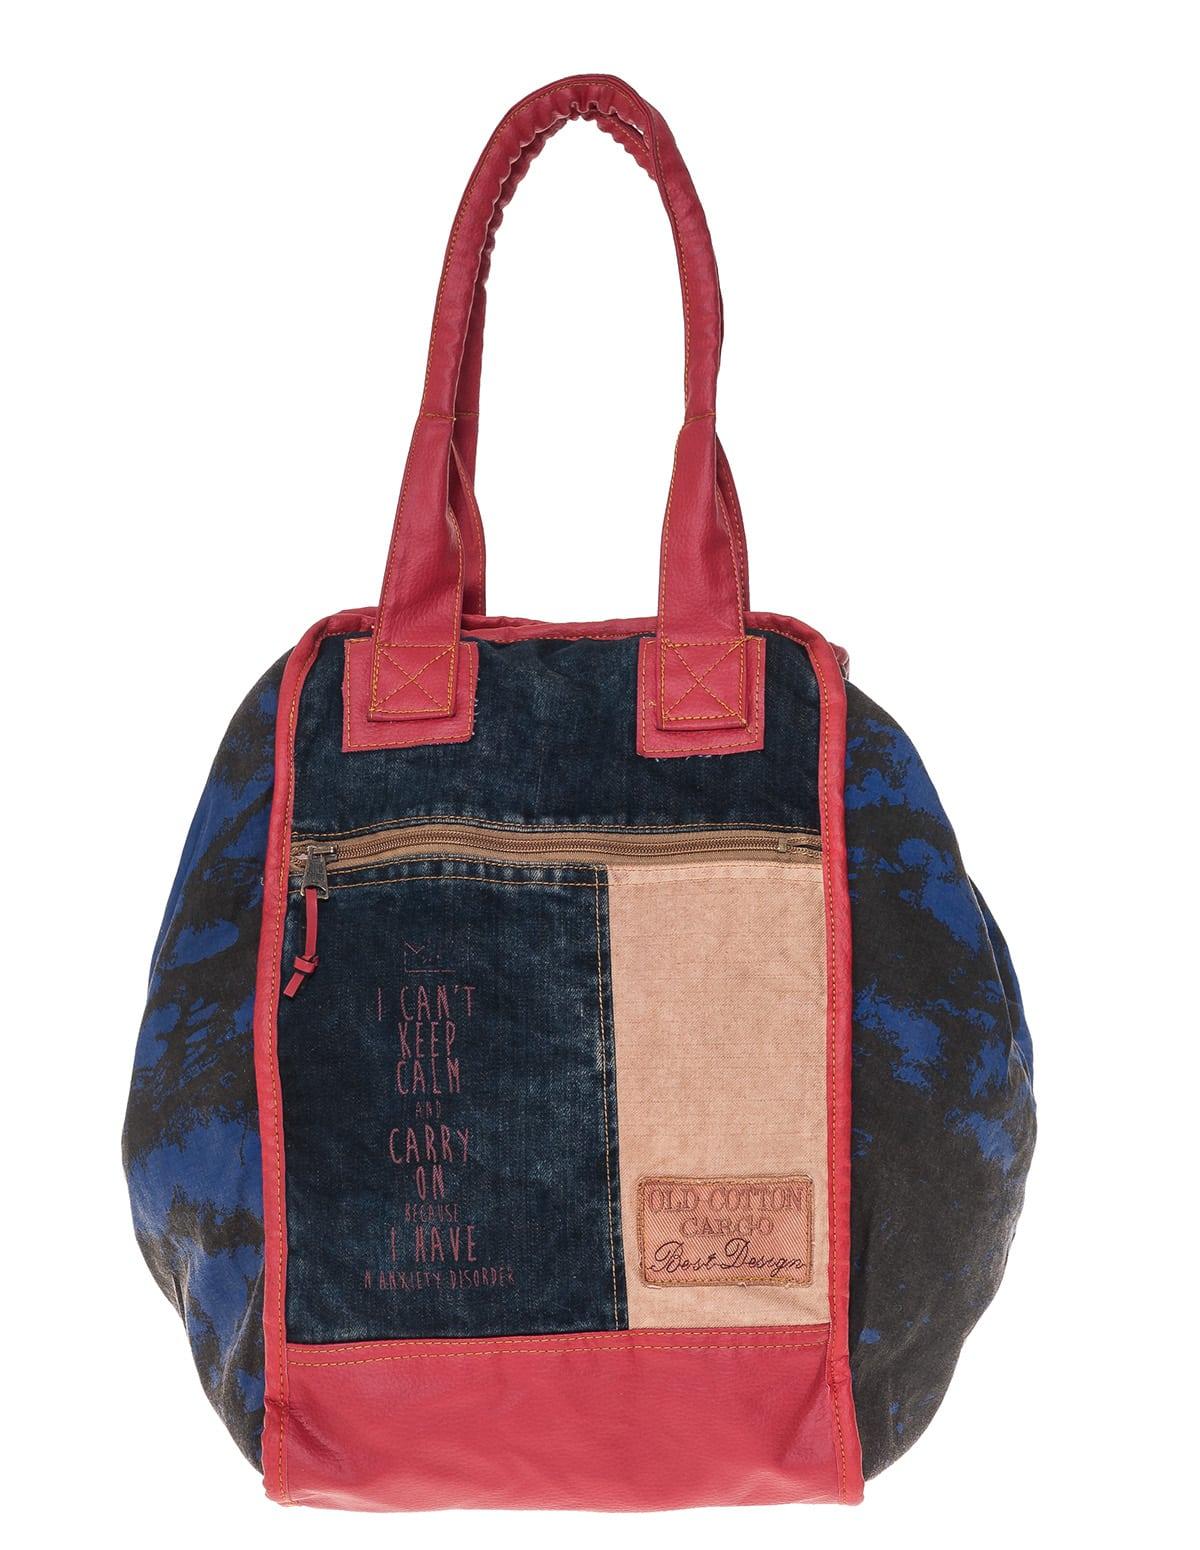 205411c8e3 Υφασμάτινη χειροποίητη τσάντα σάκος ώμου - vactive.gr